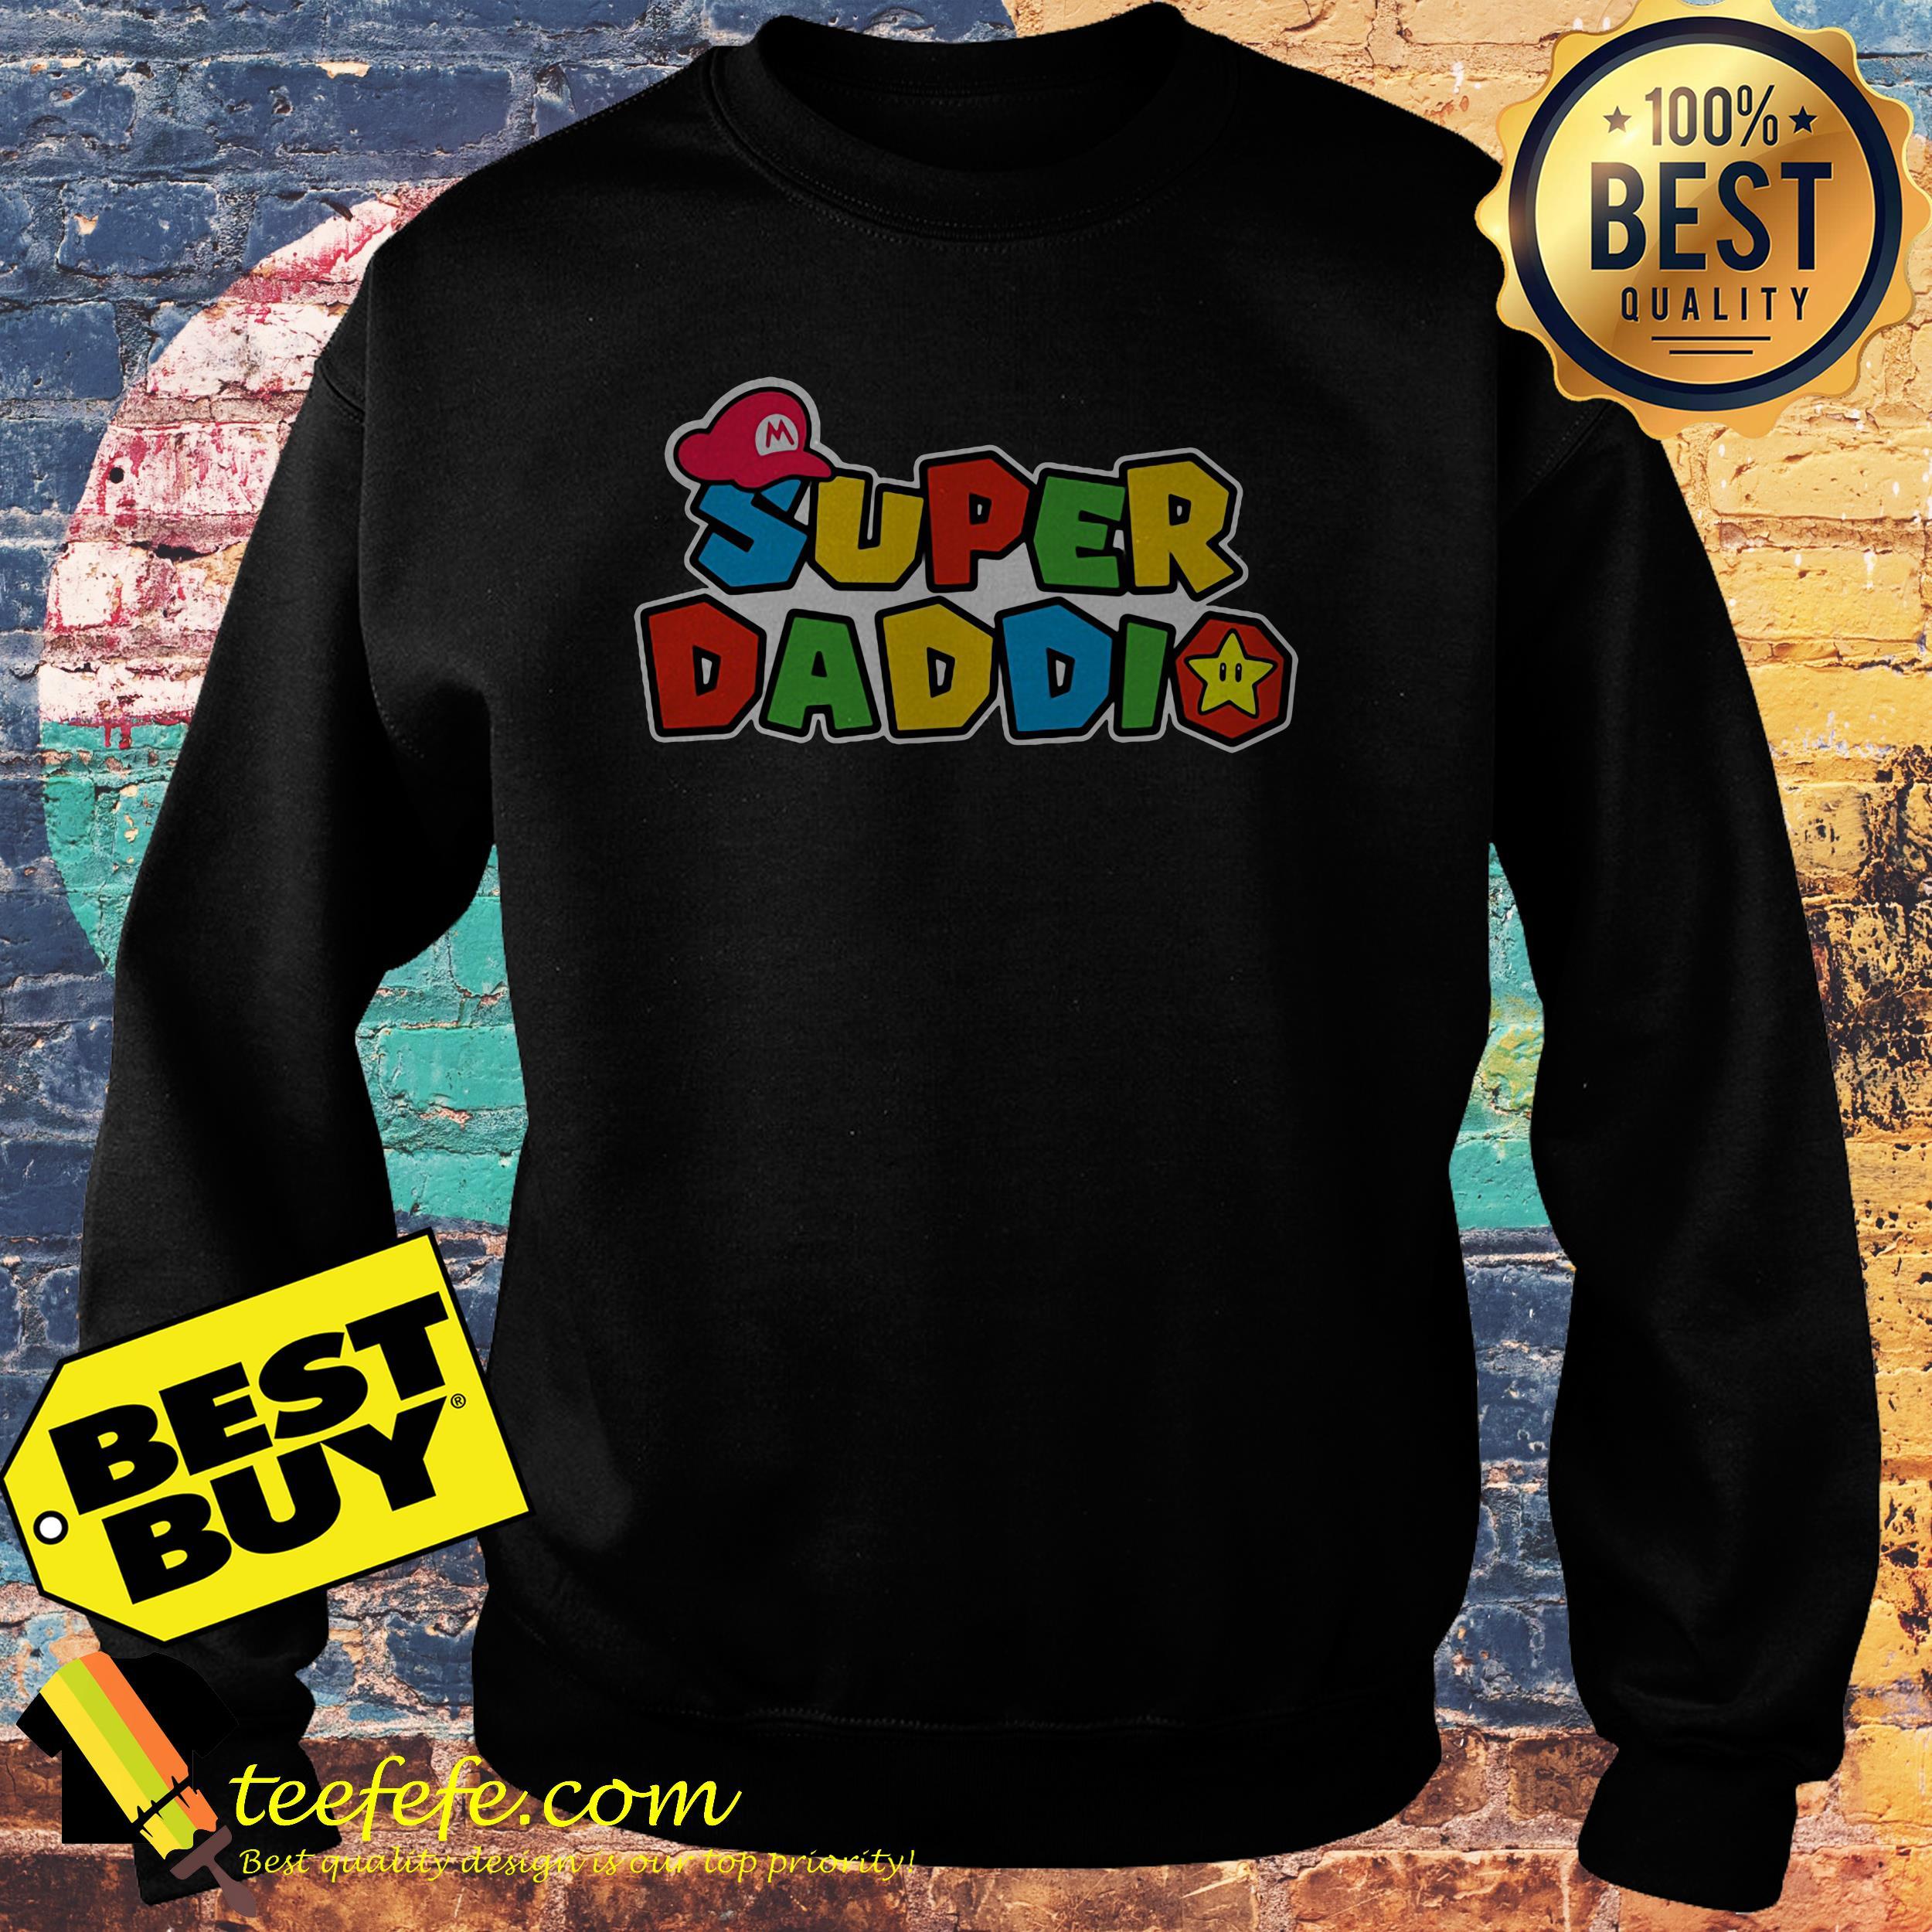 Super Daddio Super Mario sweatshirt